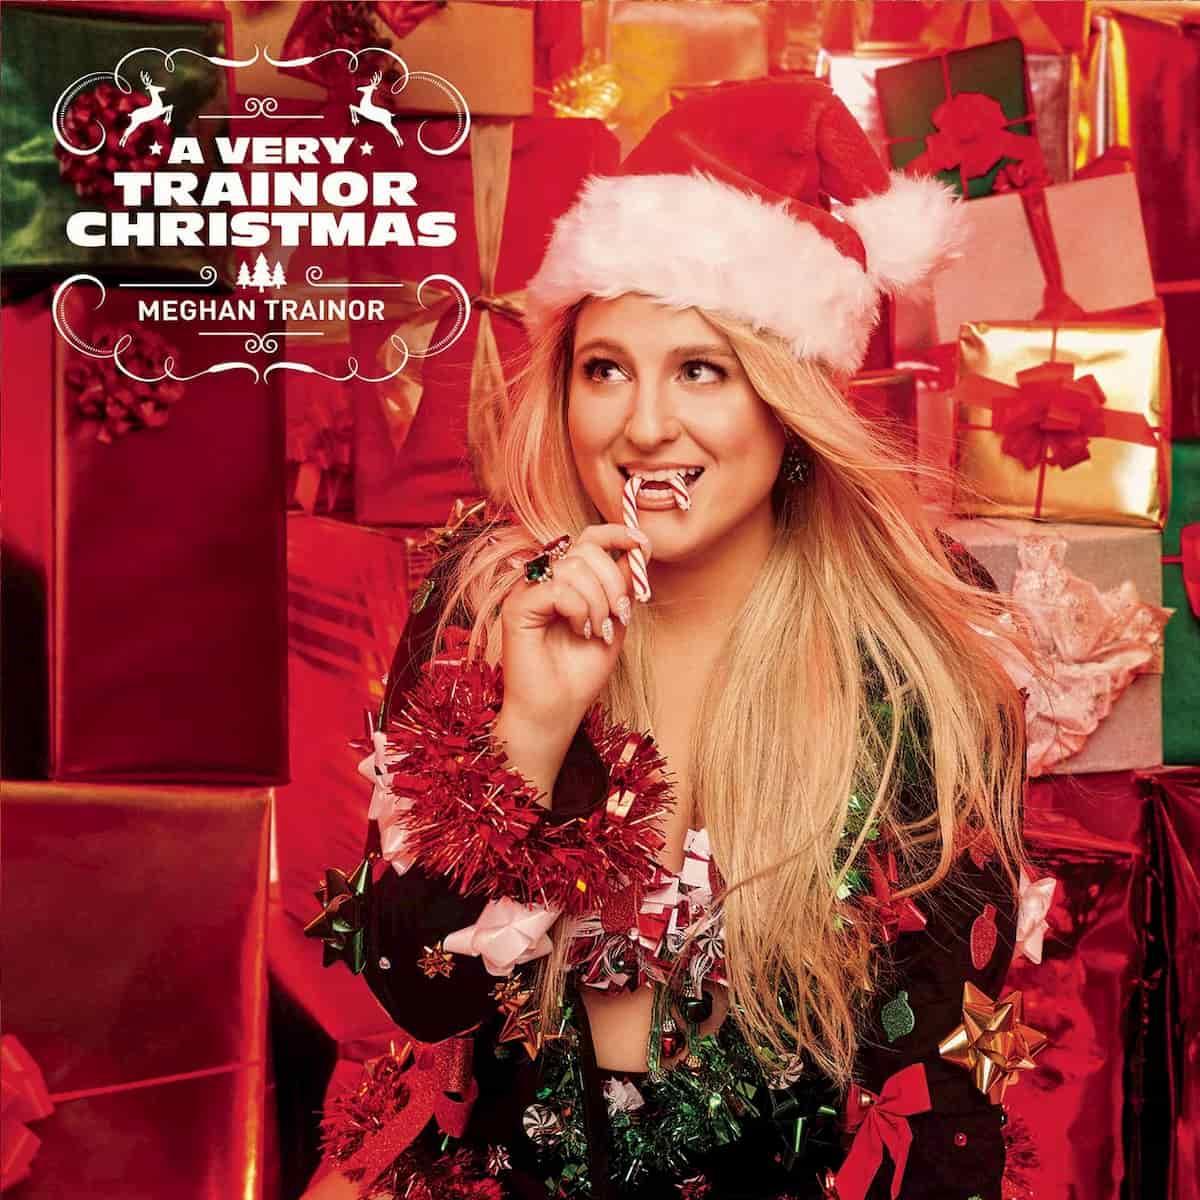 Meghan Trainor Weihnachts-Album 2020 - A Very Trainor Christmas